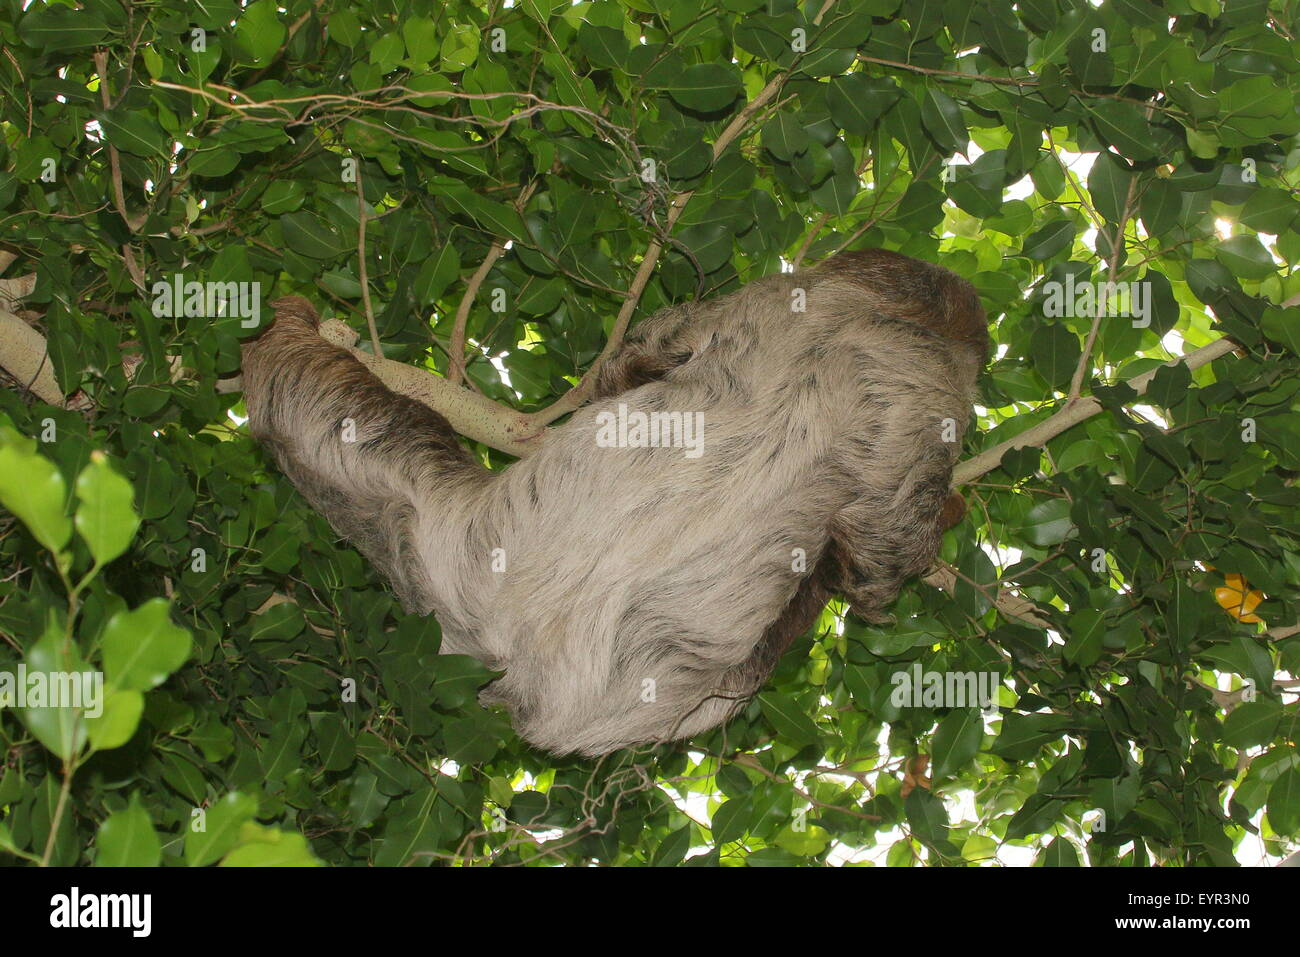 South American Linnaeus dos vetado pereza o del Sur dos dedos cada sloth (Choloepus didactylus) Foto de stock